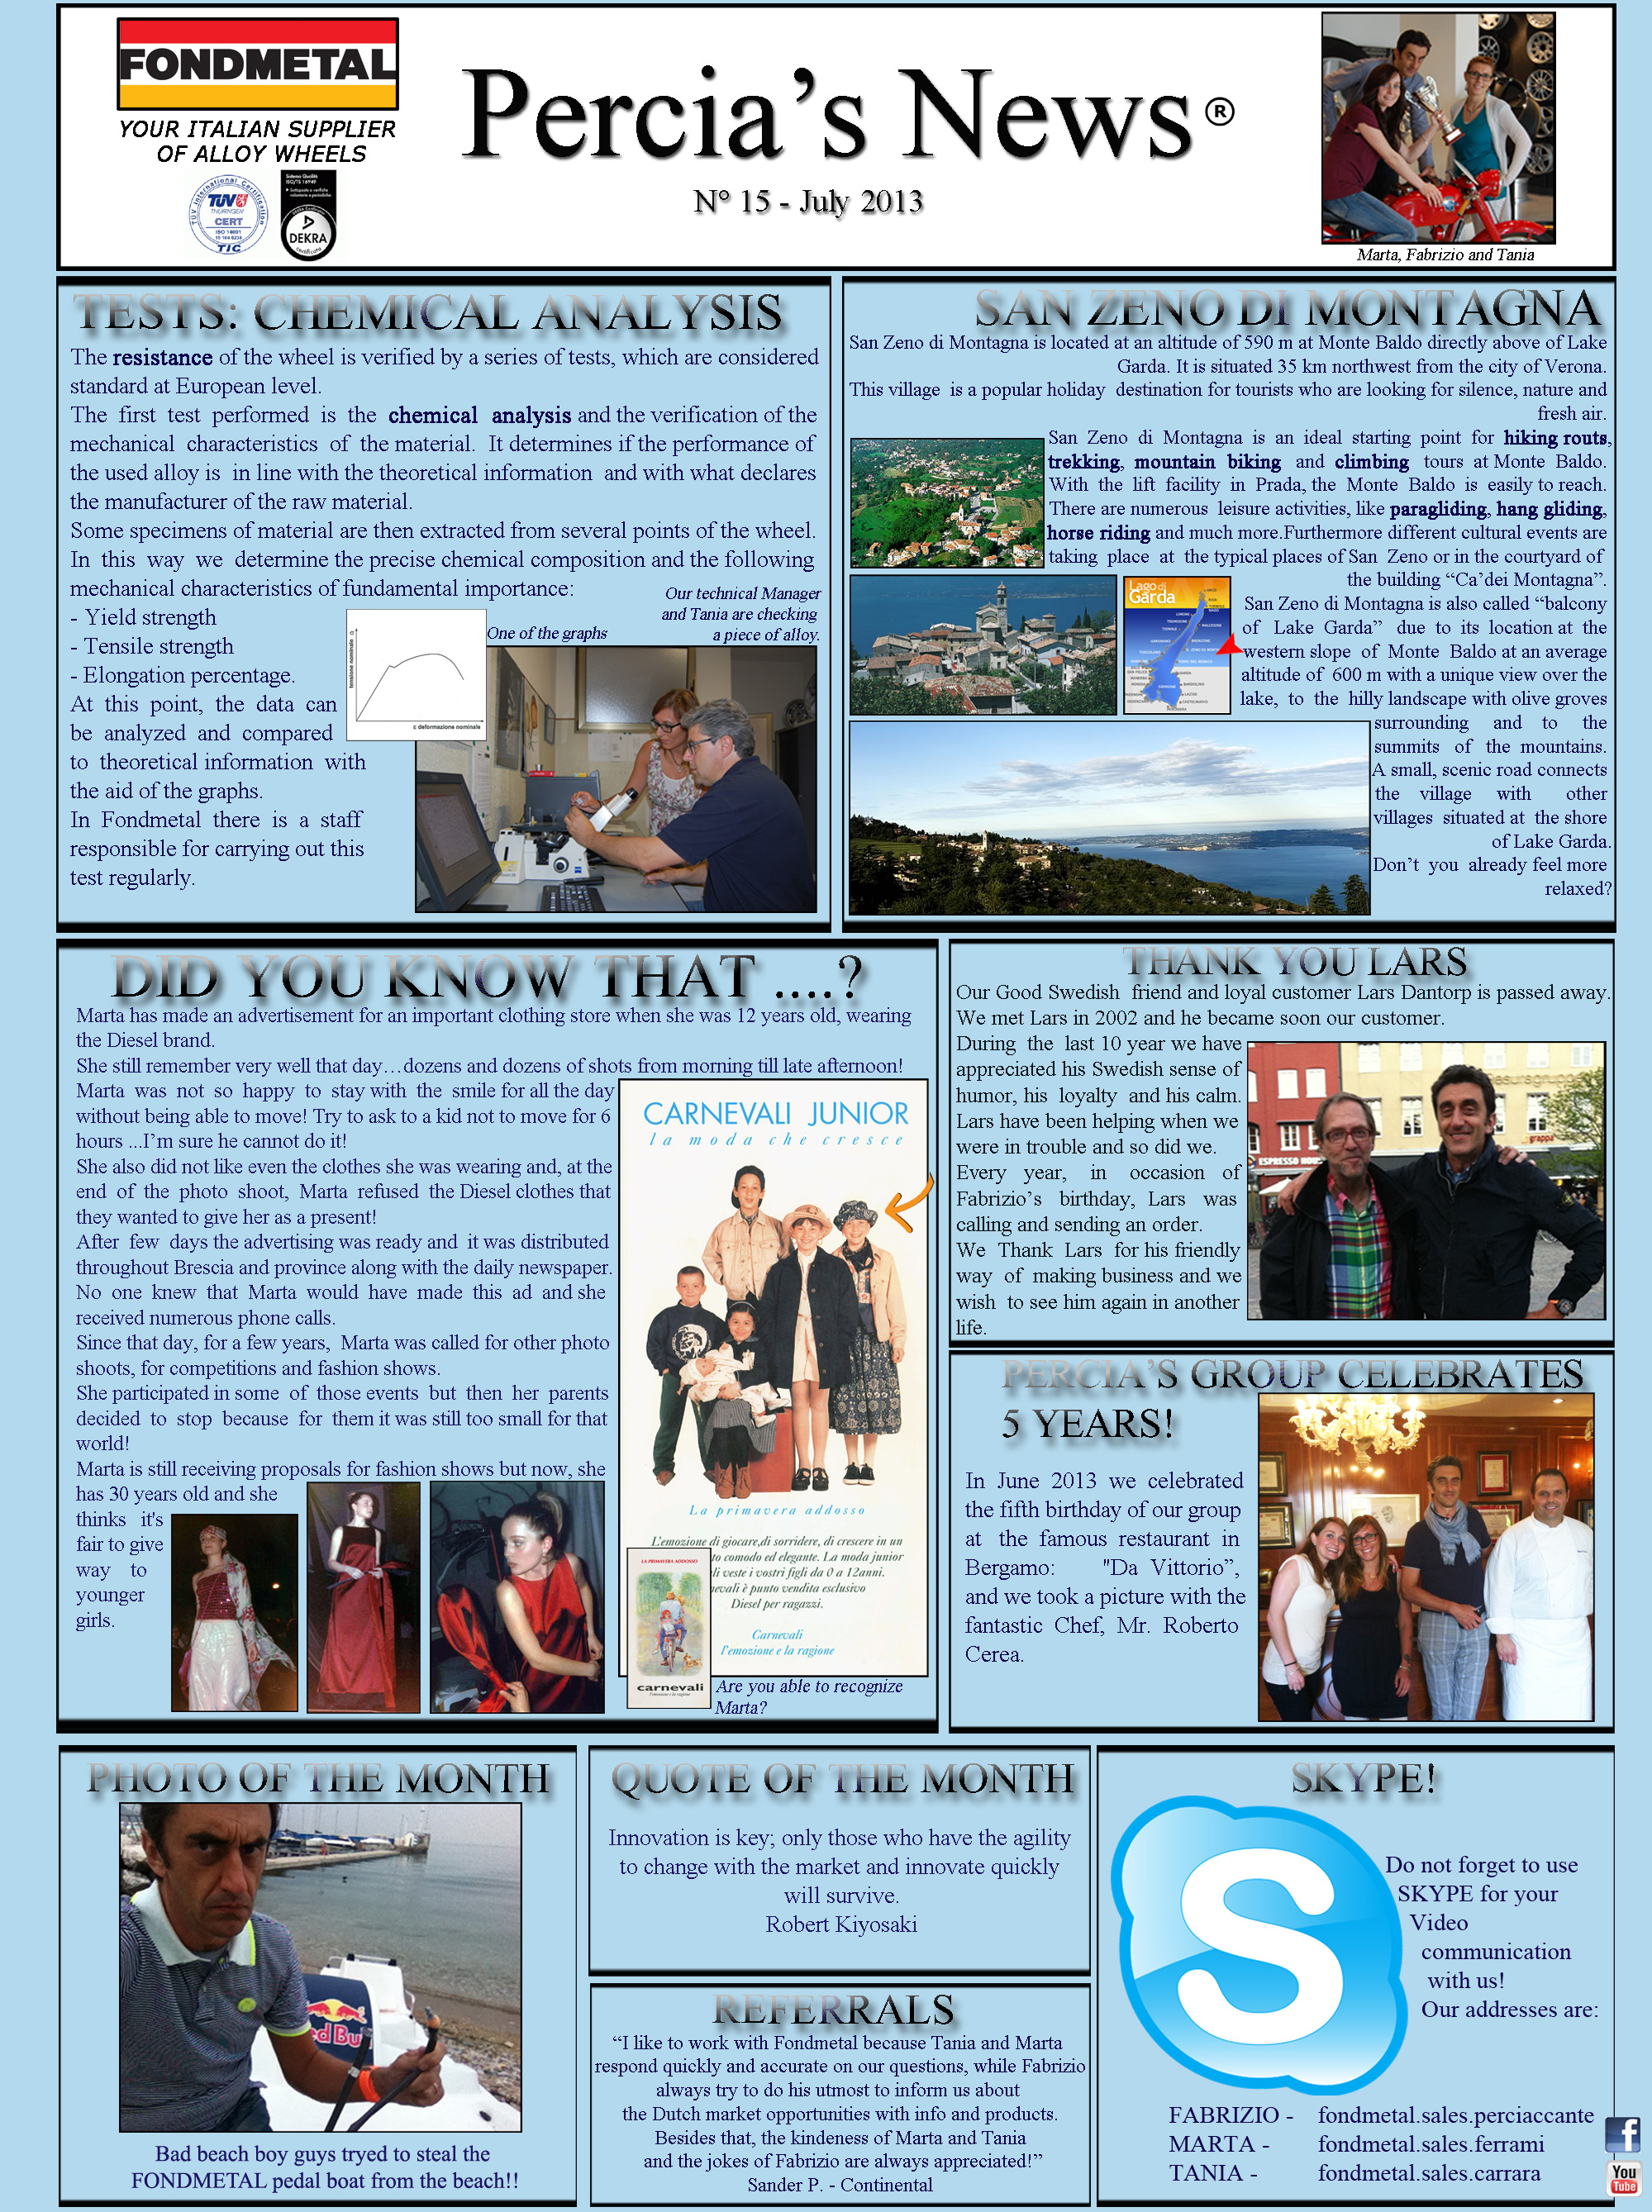 PERCIA'S NEWS JULY 2013